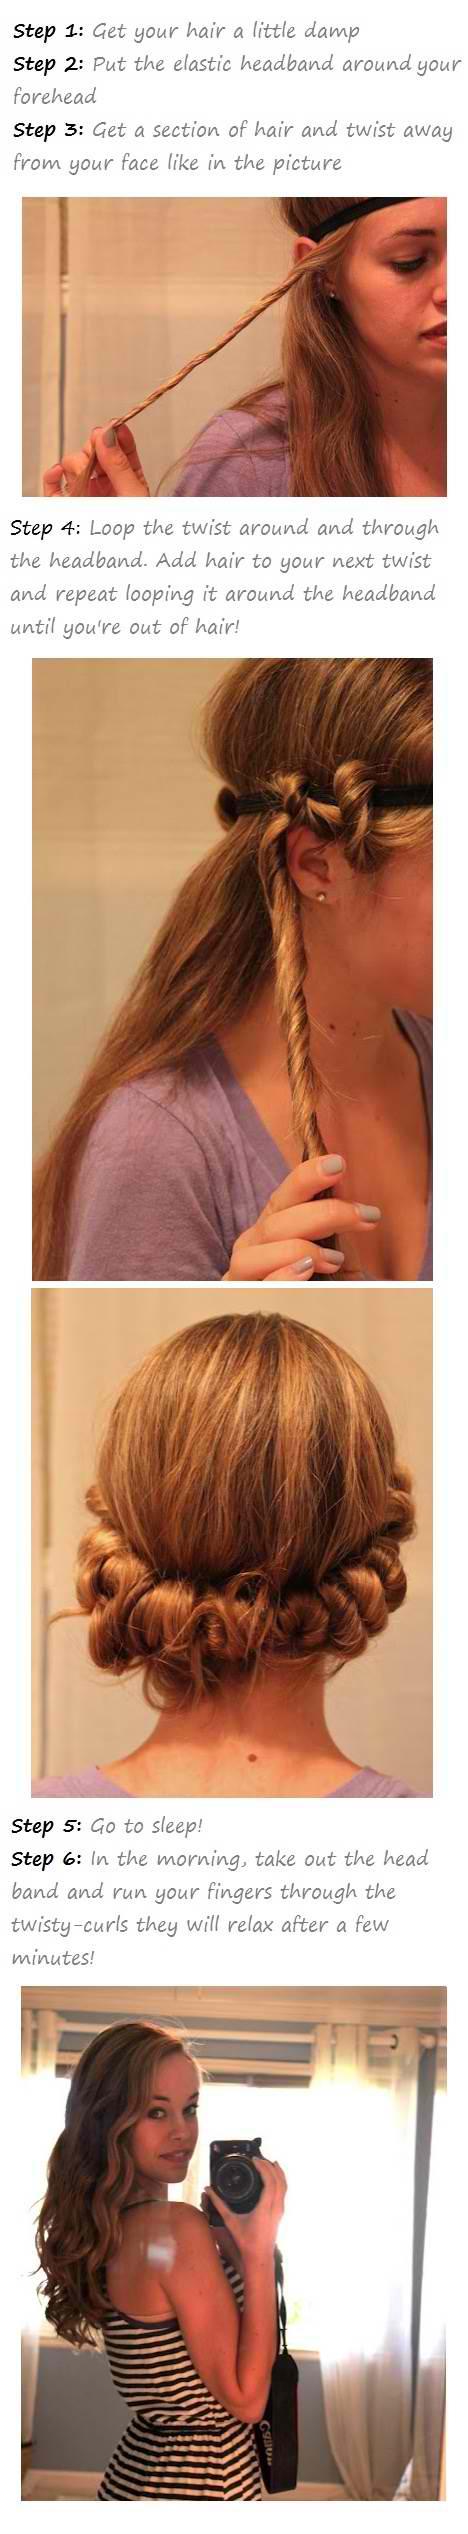 Natural Curls using loose headband SOOO CUTE!! gonna do it in a bit!:)